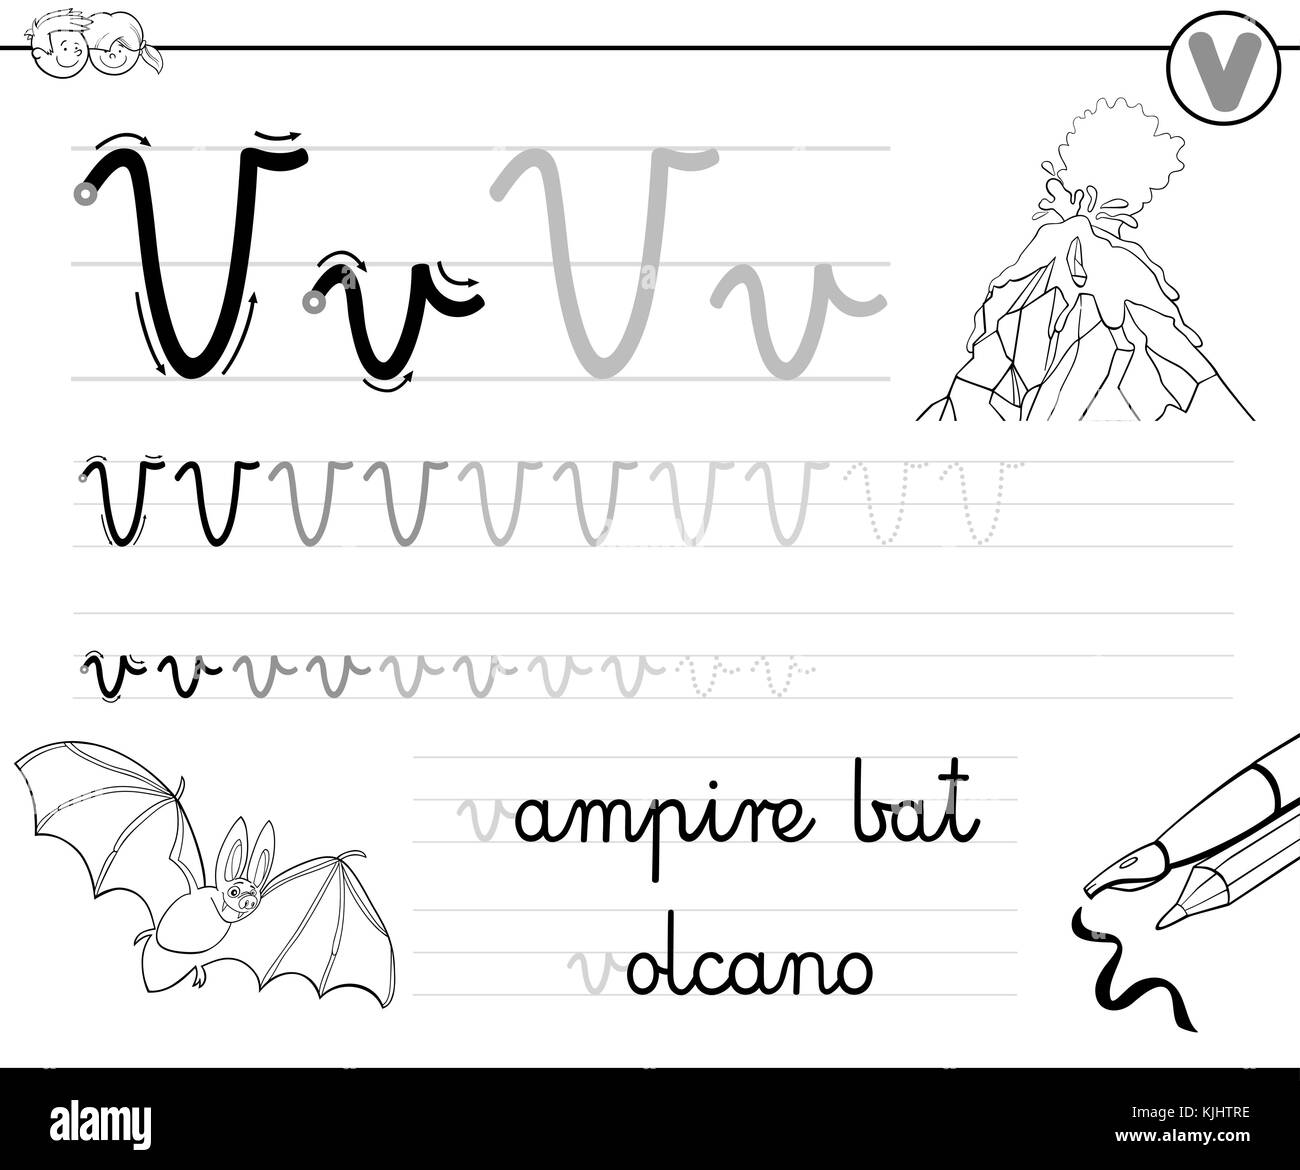 Cartoon Illustration Writing Skills Practice Stock Photos